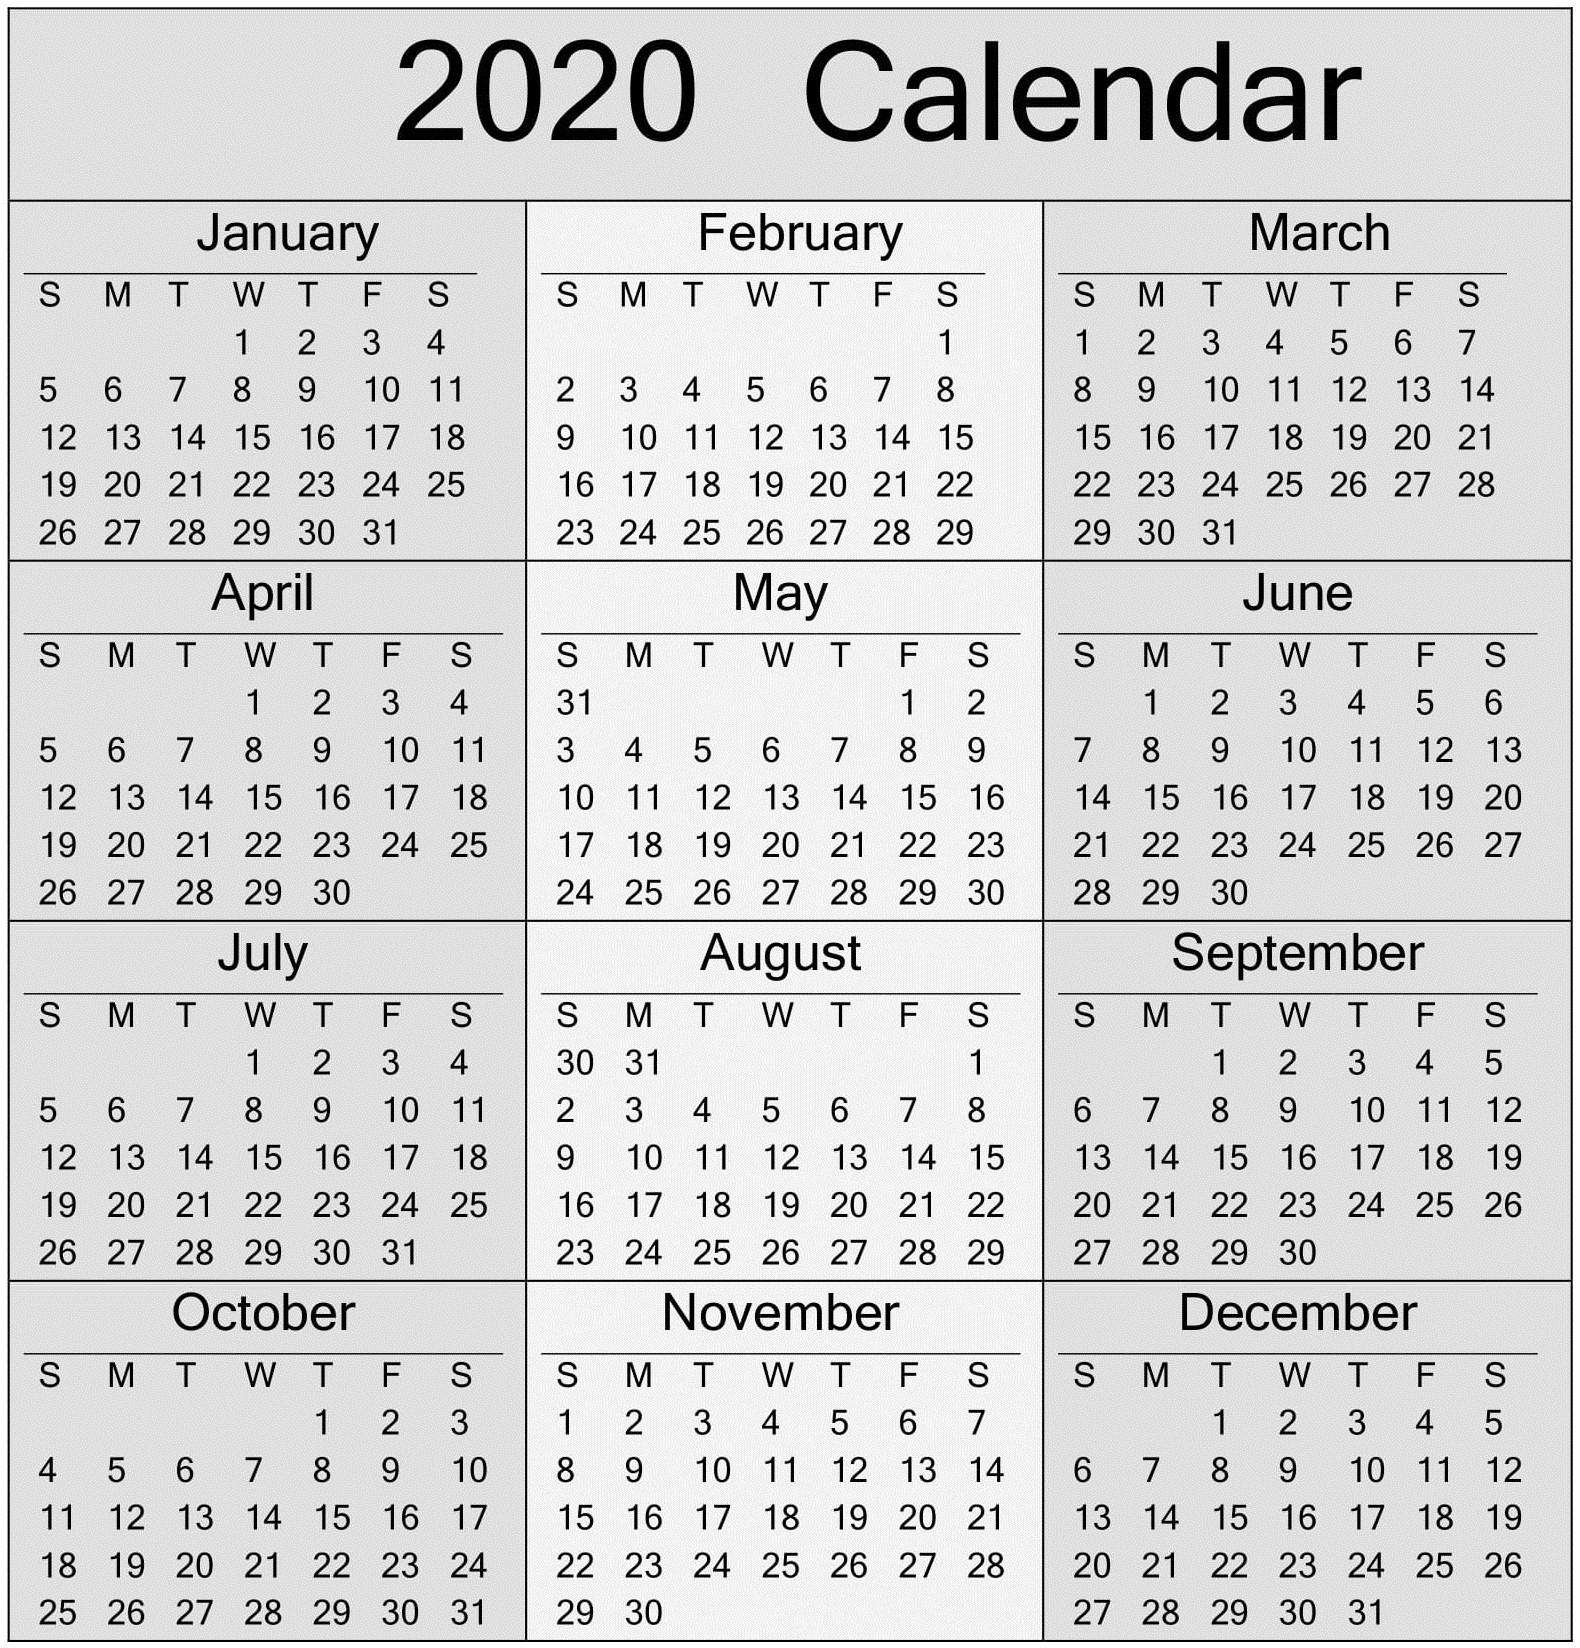 Free Printable Yearly 2020 Calendar And Holiday Templates  Free Lenten Calendar 2021